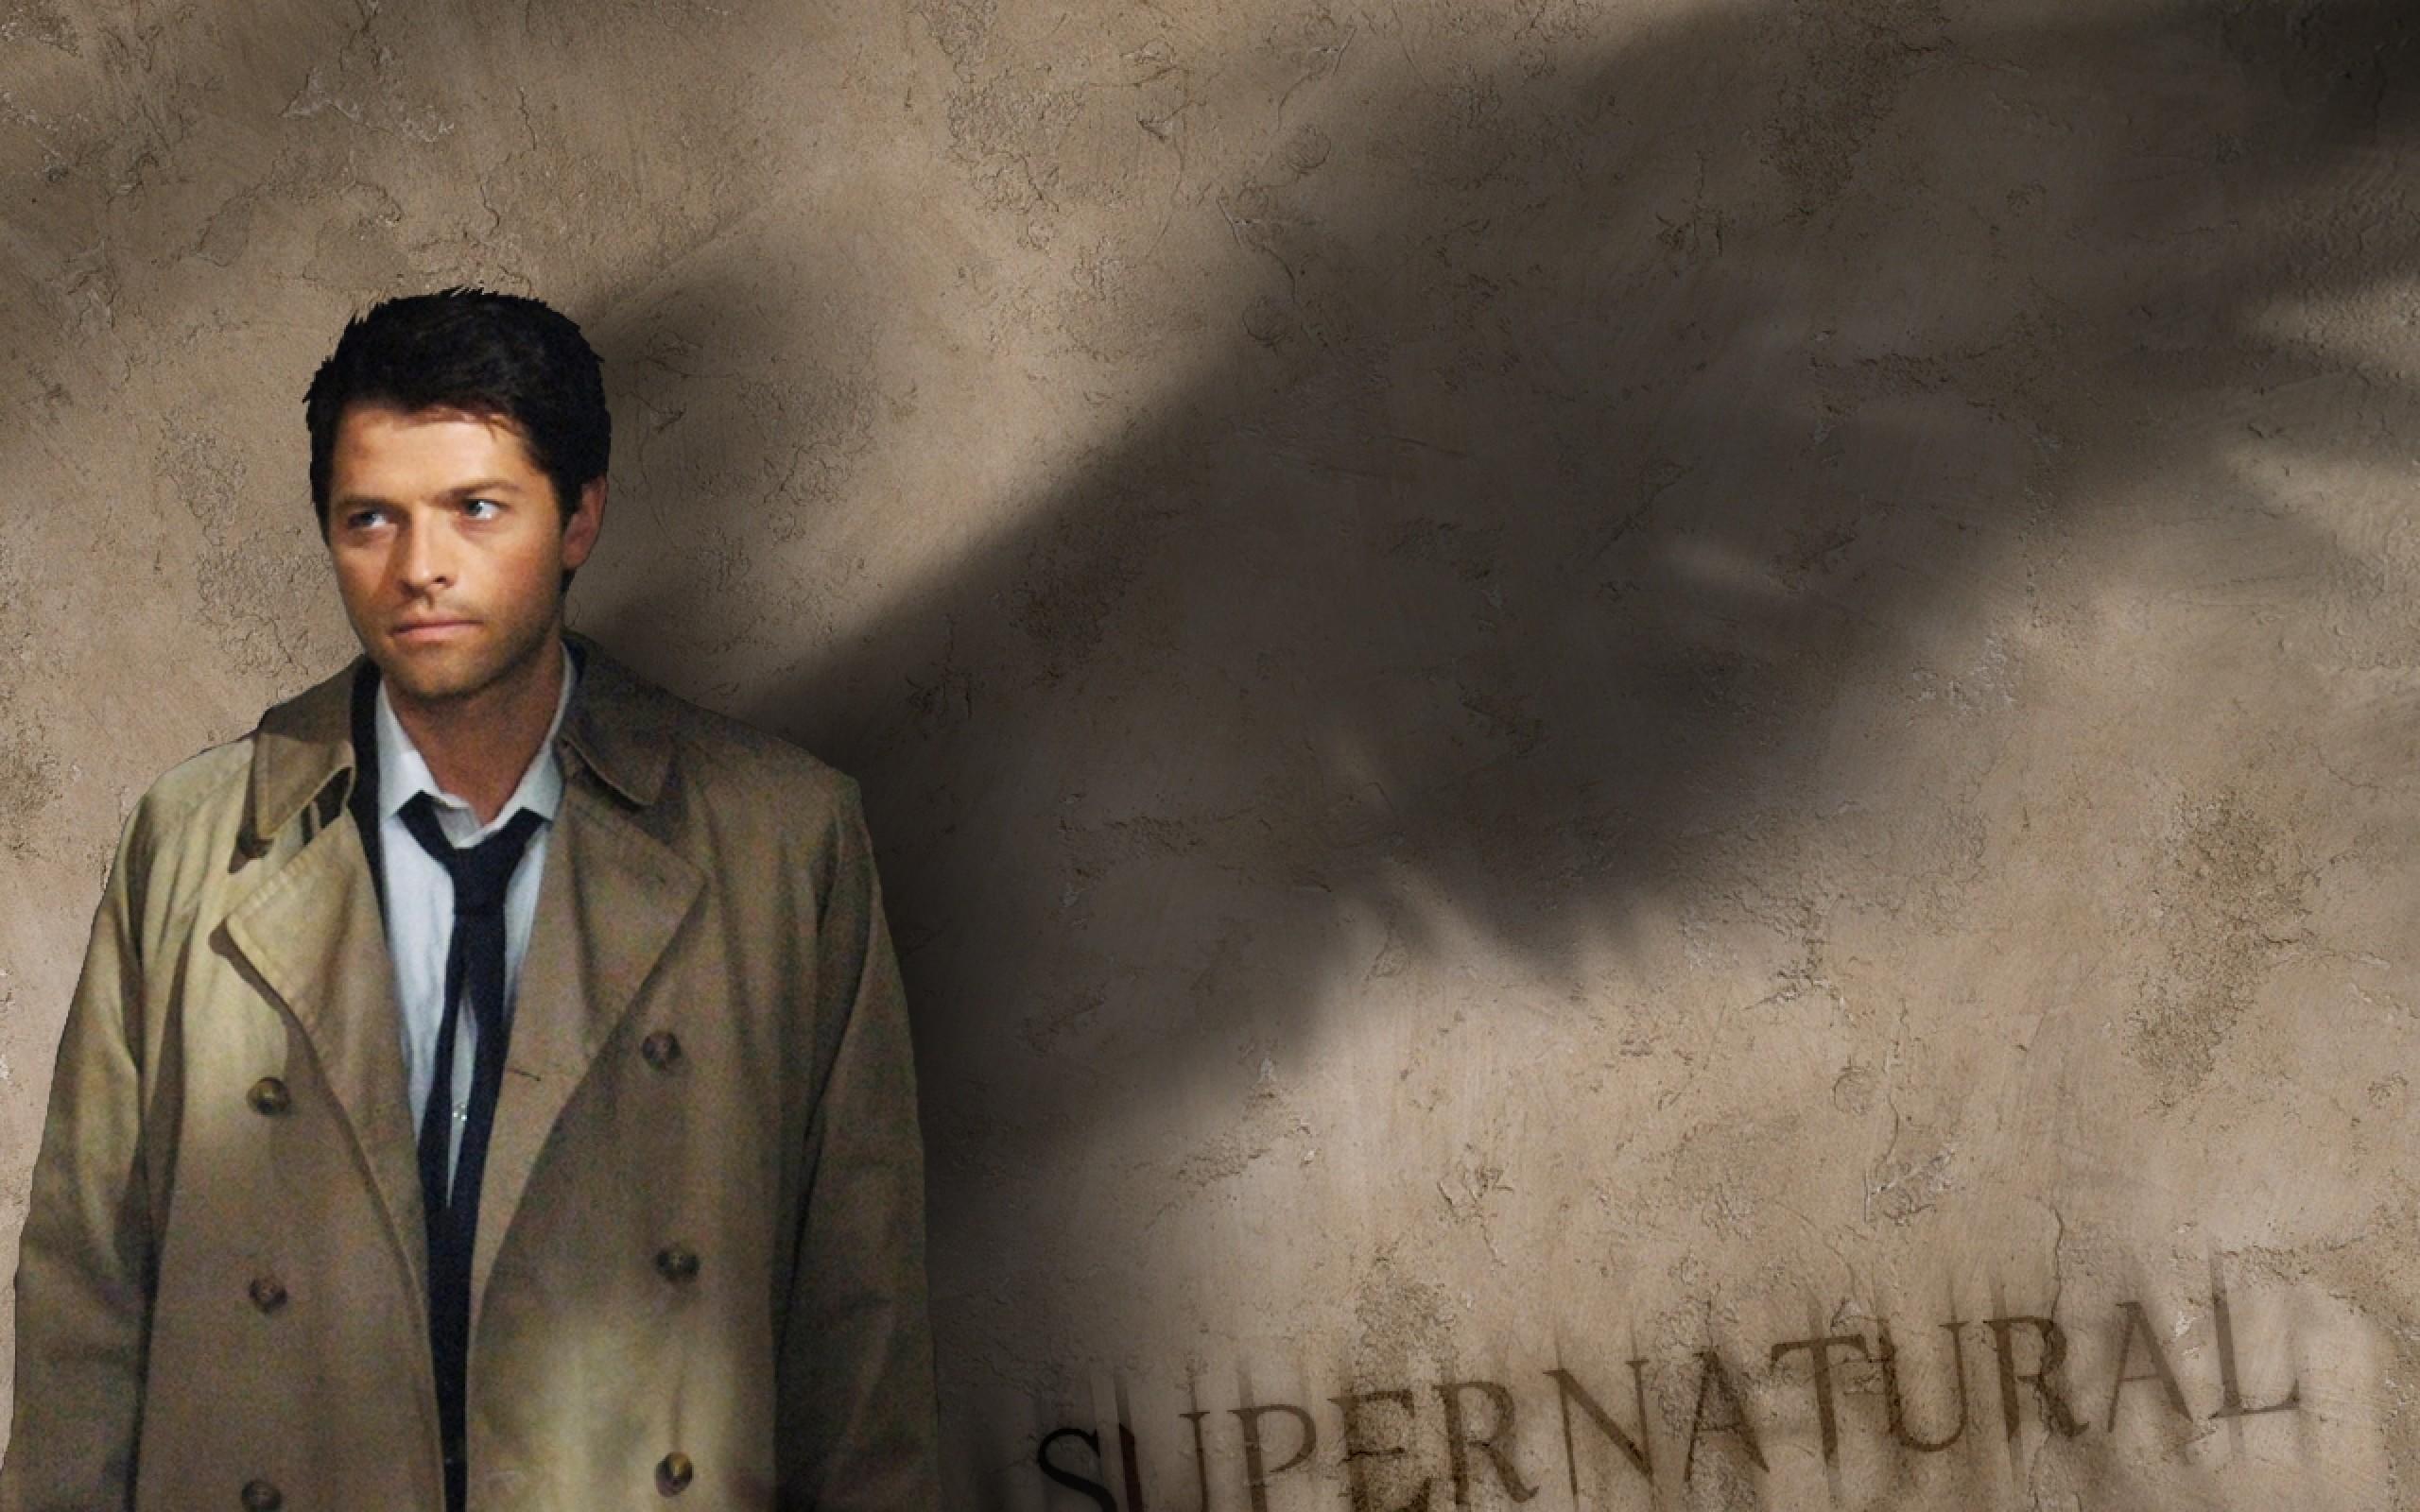 Download Castiel Supernatural Iphone Wallpapers Free